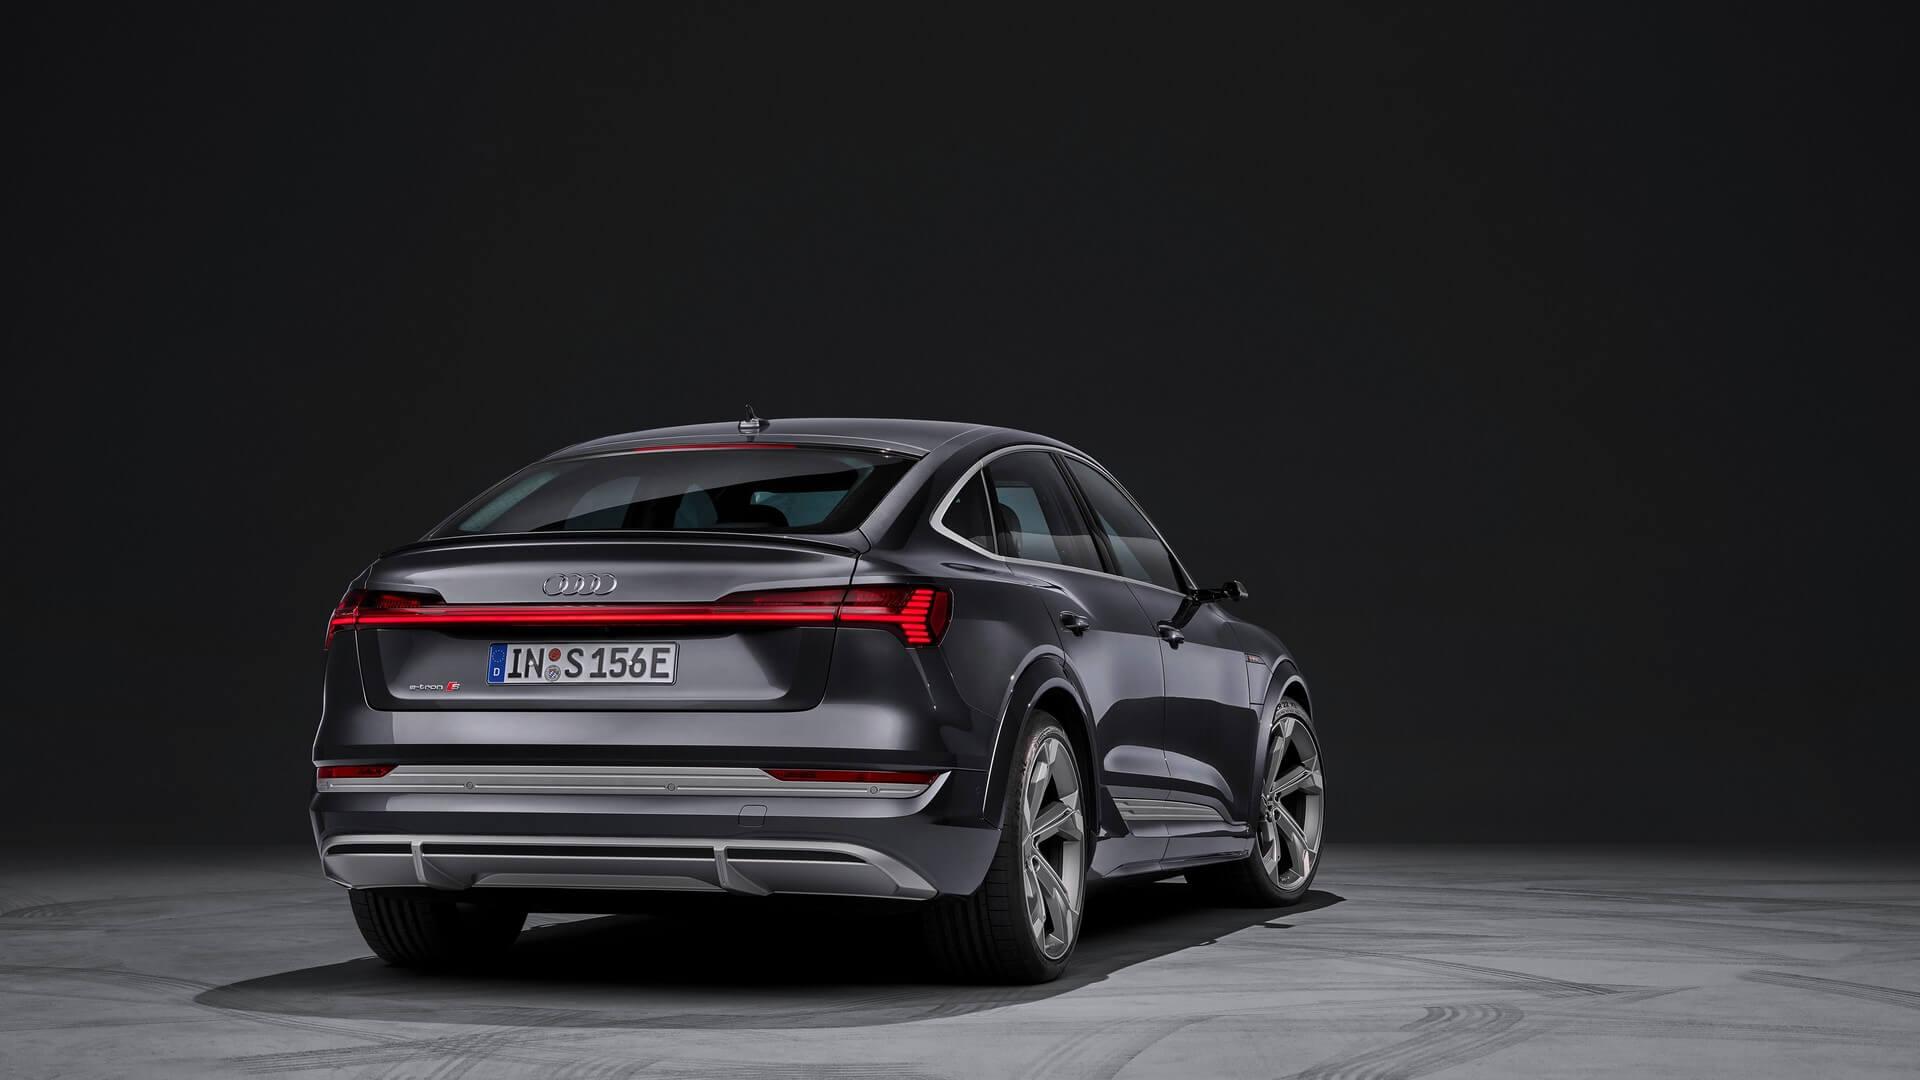 Audi-E-Tron-S-and-E-Tron-S-Sportback-2020-66